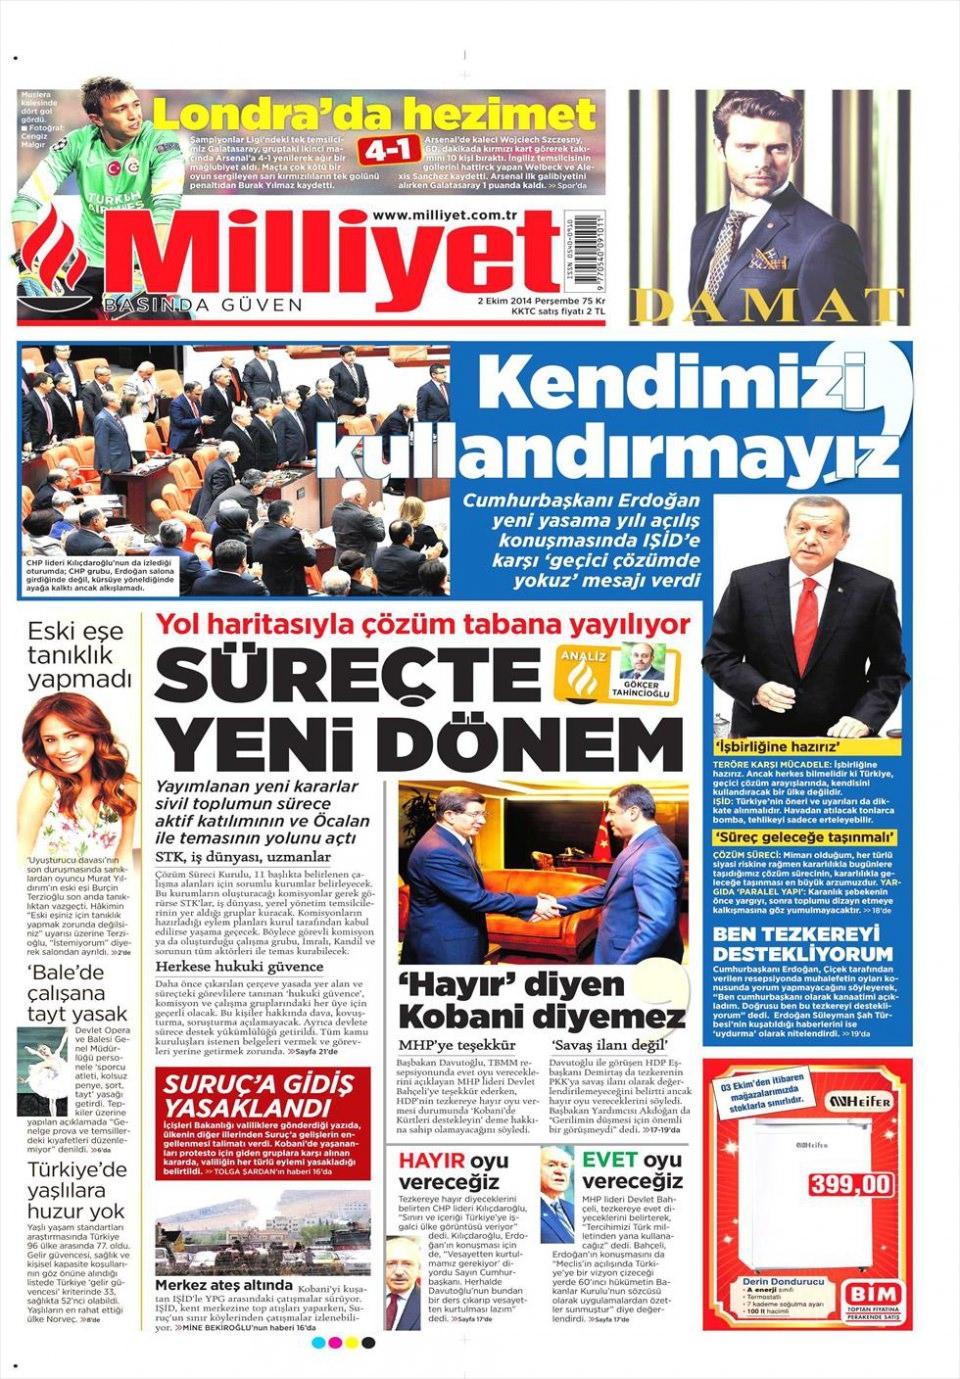 2 Ekim 2014 gazete manşetleri 12